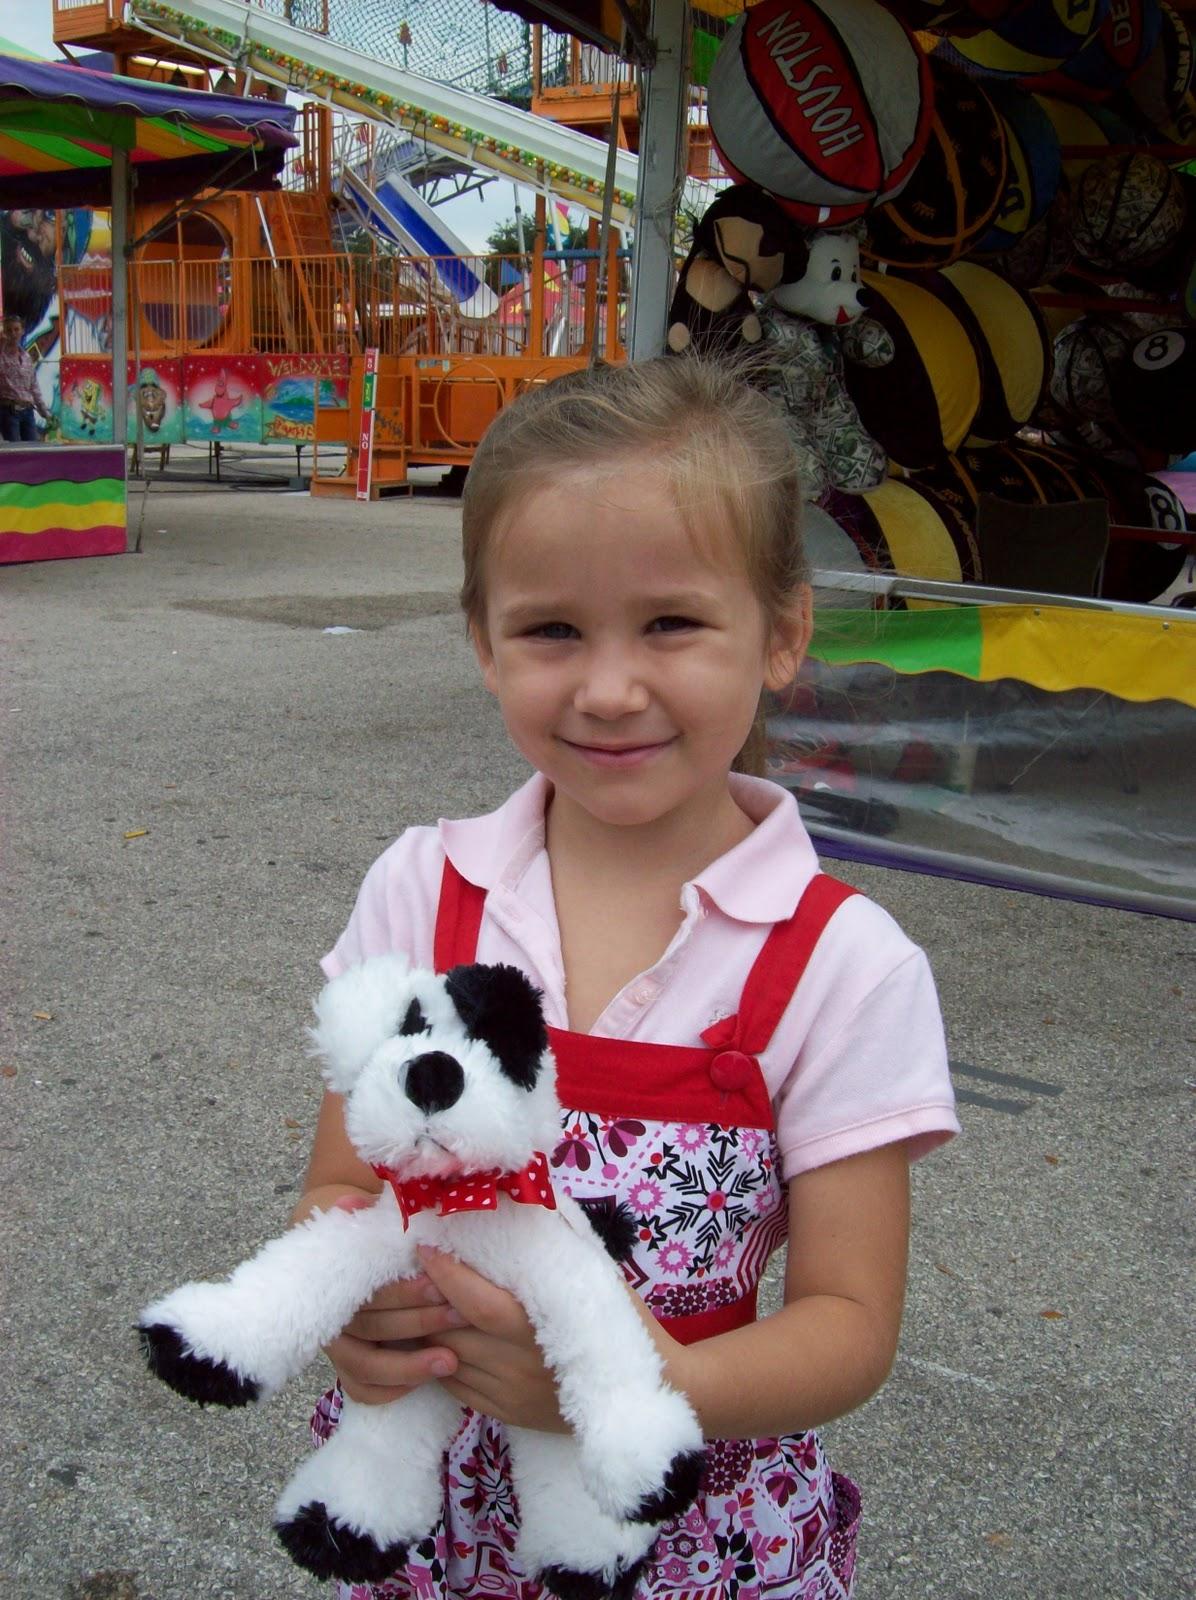 Fort Bend County Fair - 101_5566.JPG